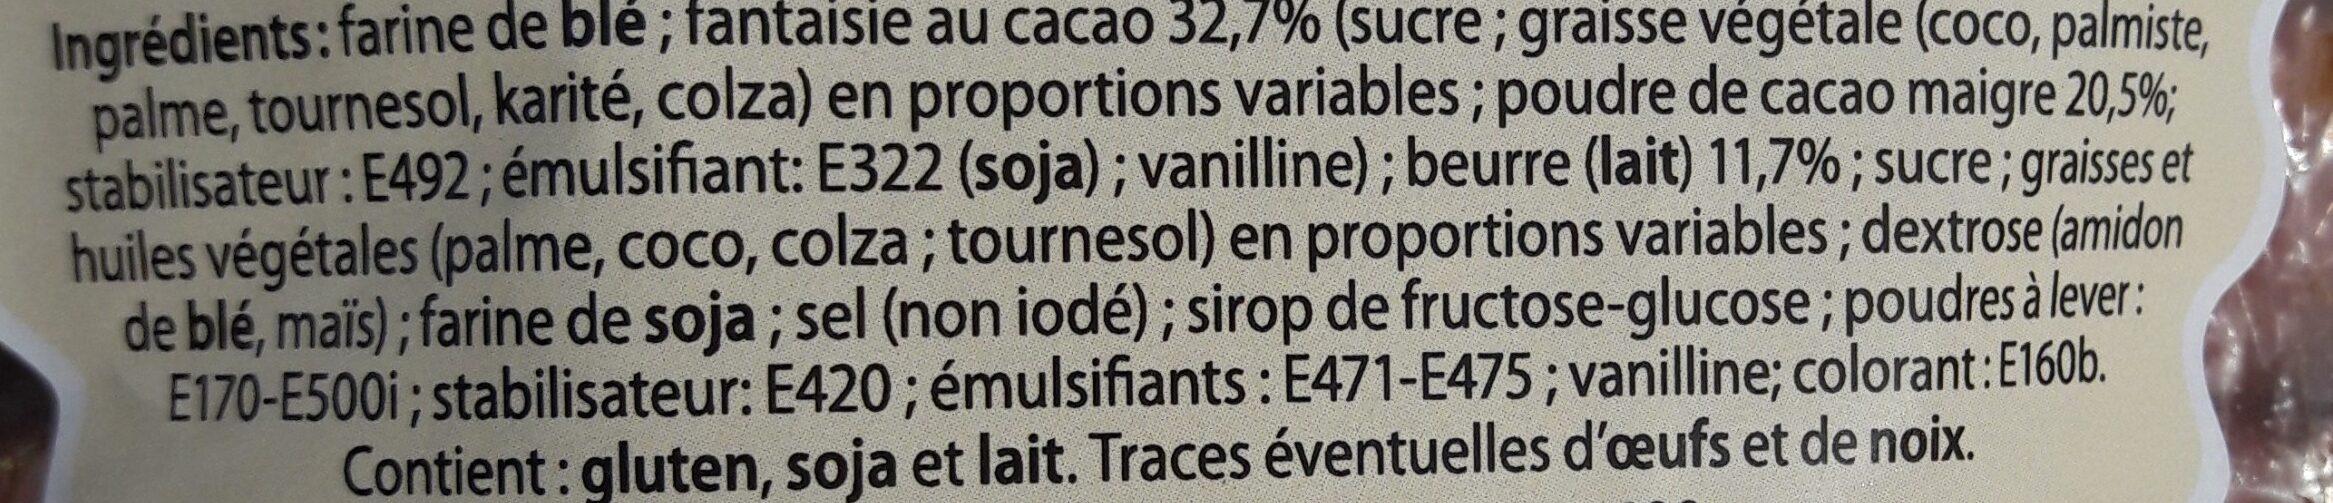 Marguerites cacao - Ingrédients - fr